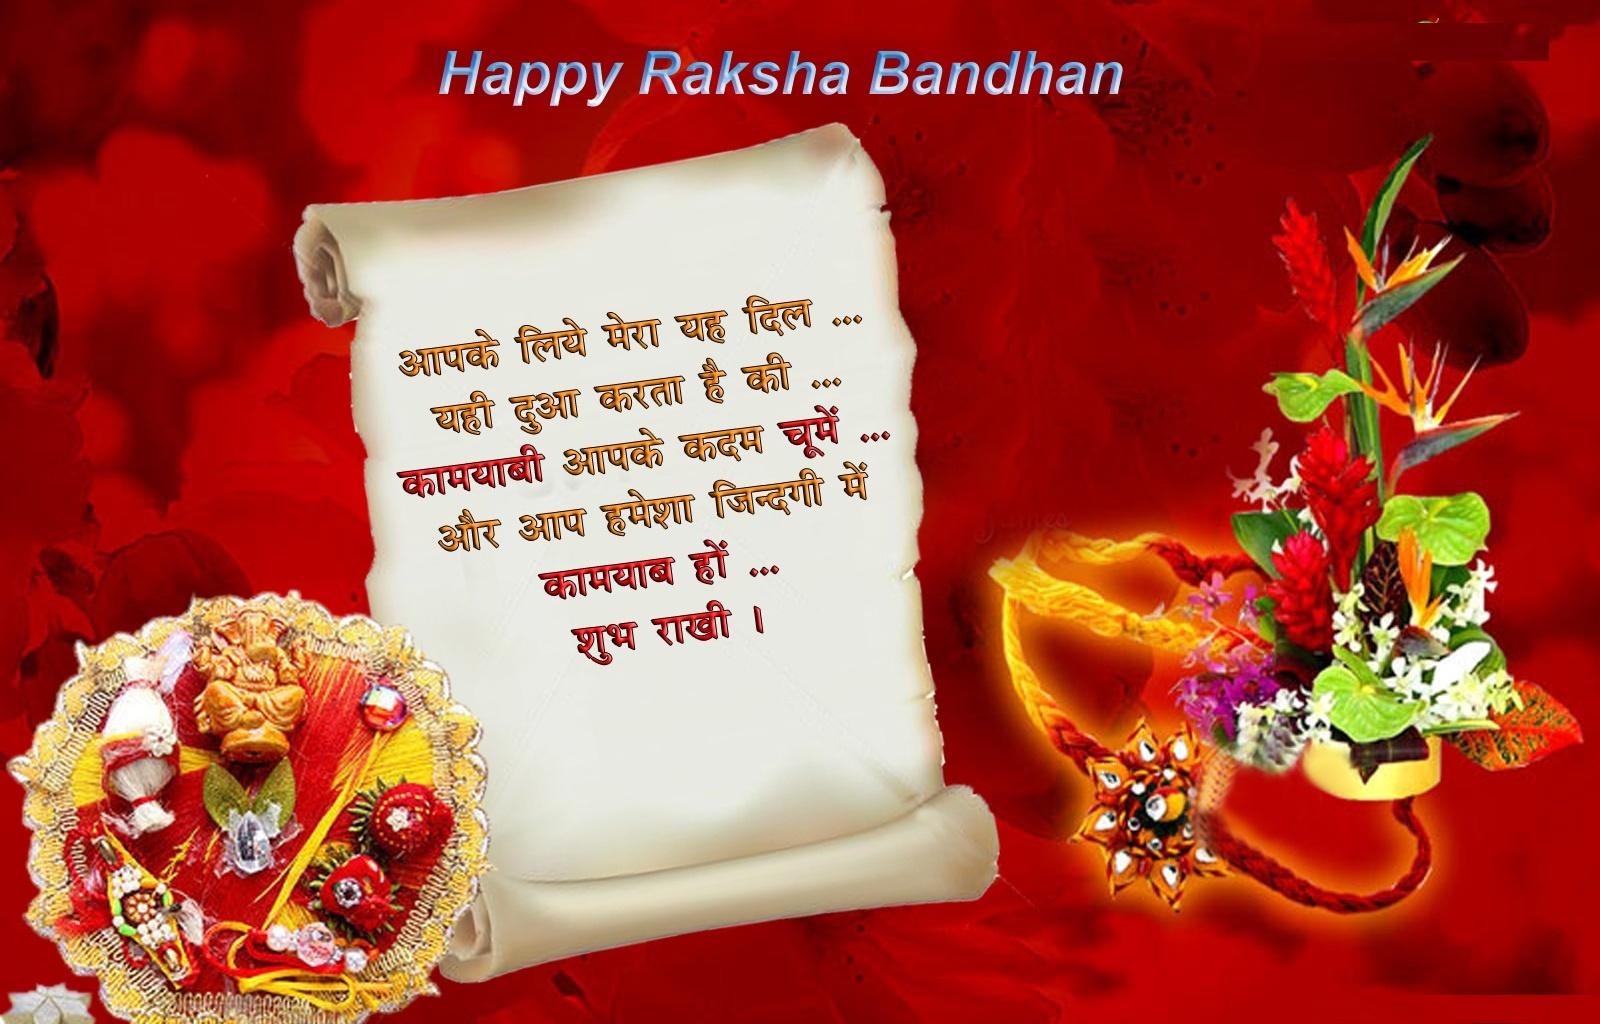 Happy Raksha Bandhan Images HD, Wallpapers for Whatsapp DP – Free Download